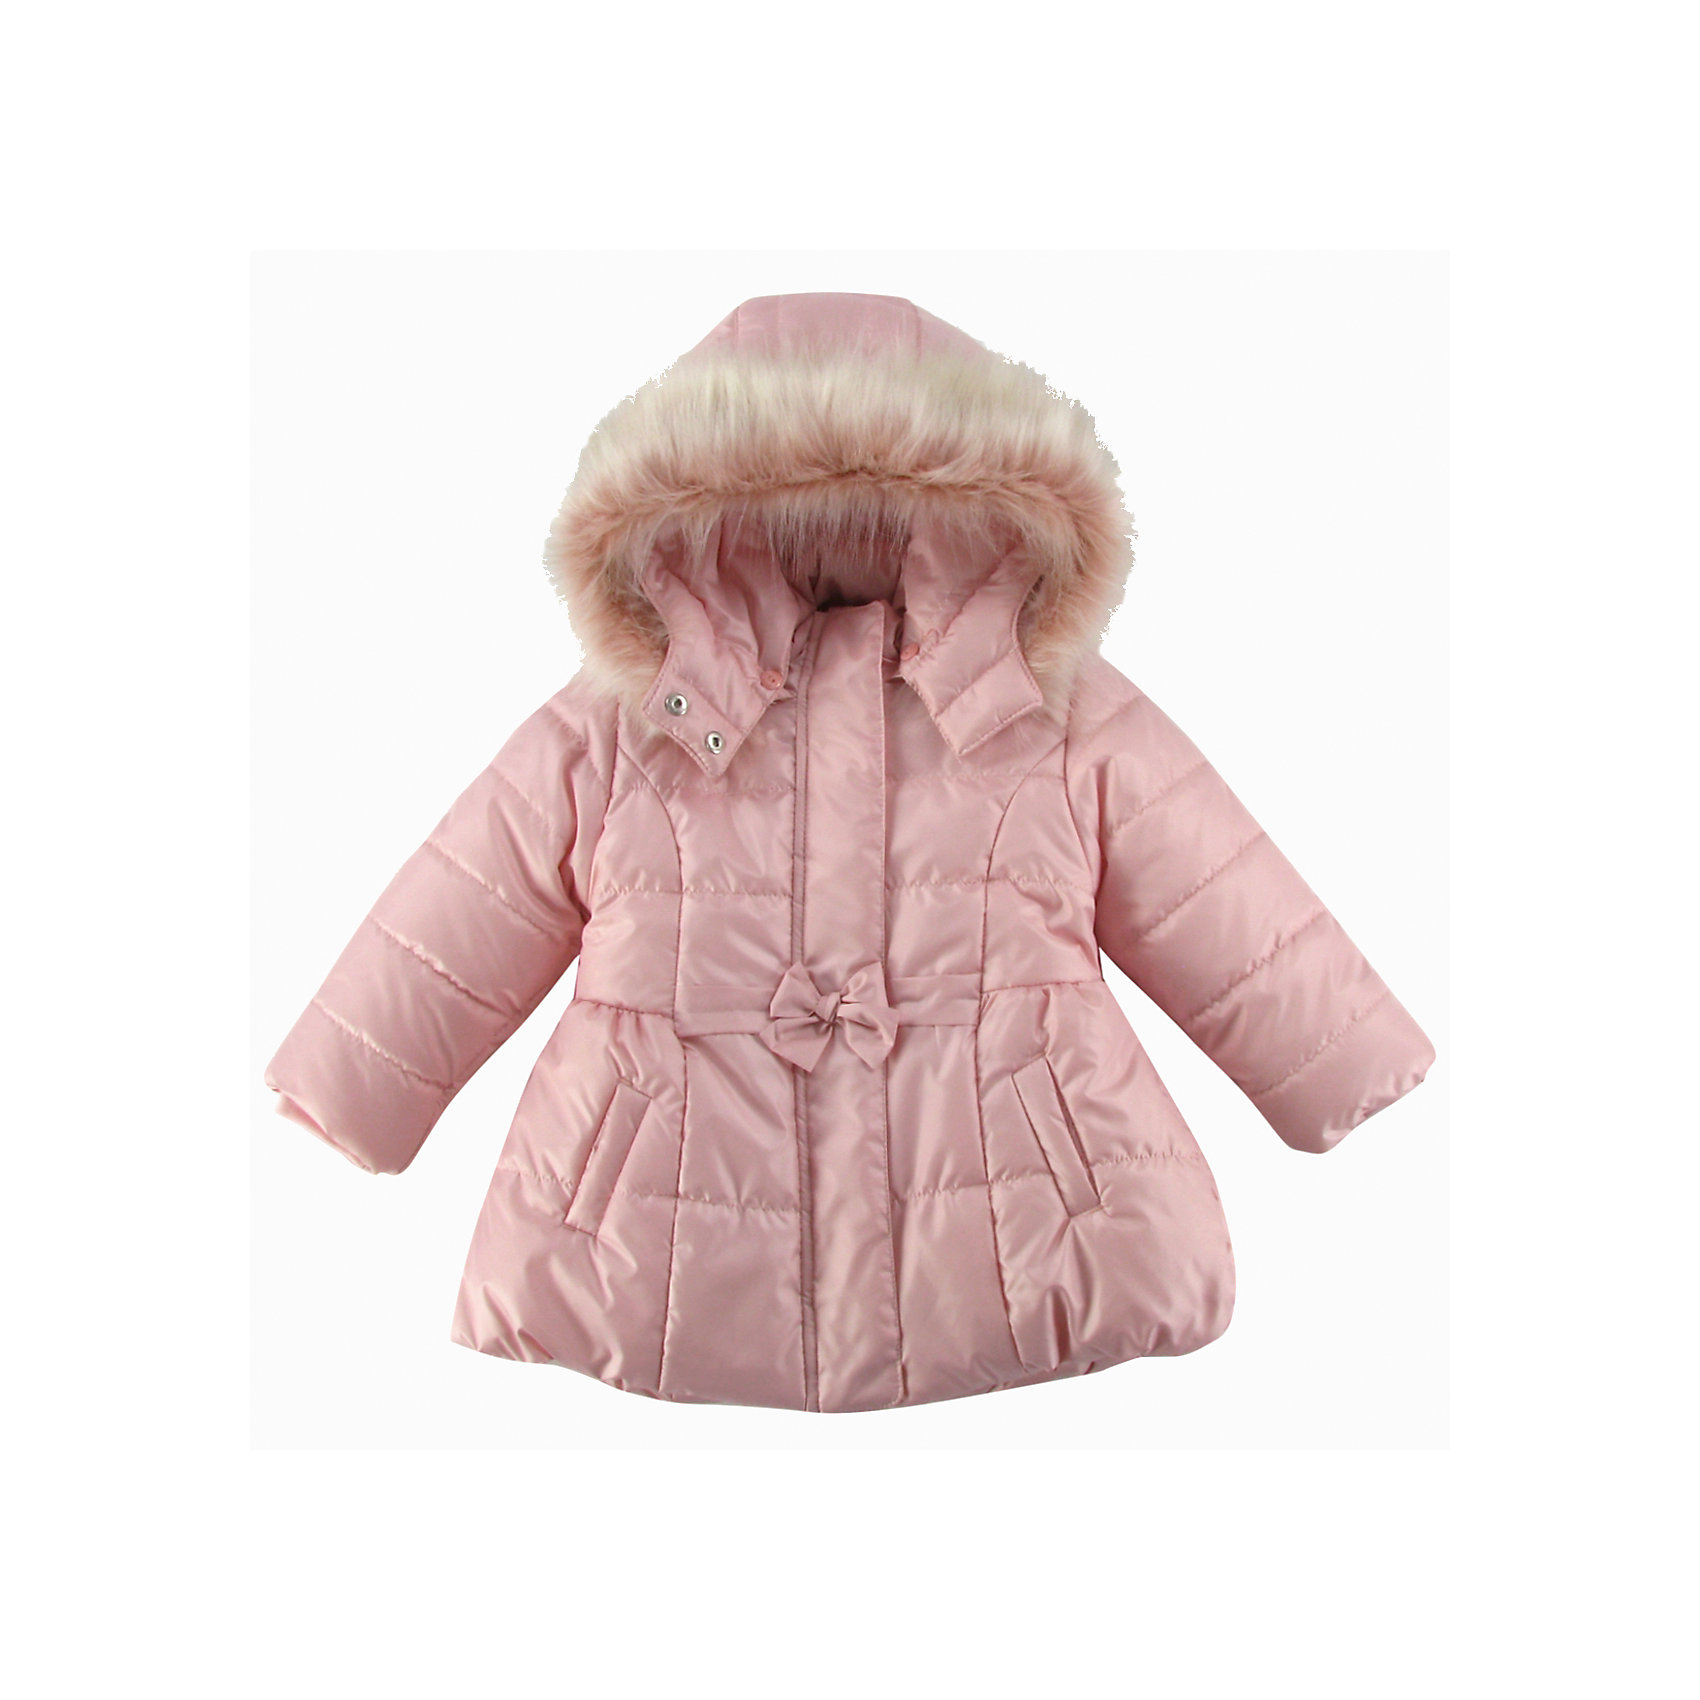 Куртка утепленная для девочки WojcikВерхняя одежда<br>Куртка утепленная для девочки Wojcik<br>Состав:<br>Полиэстер 100%<br><br>Ширина мм: 356<br>Глубина мм: 10<br>Высота мм: 245<br>Вес г: 519<br>Цвет: розовый<br>Возраст от месяцев: 18<br>Возраст до месяцев: 24<br>Пол: Женский<br>Возраст: Детский<br>Размер: 92,98,80,86<br>SKU: 5590685